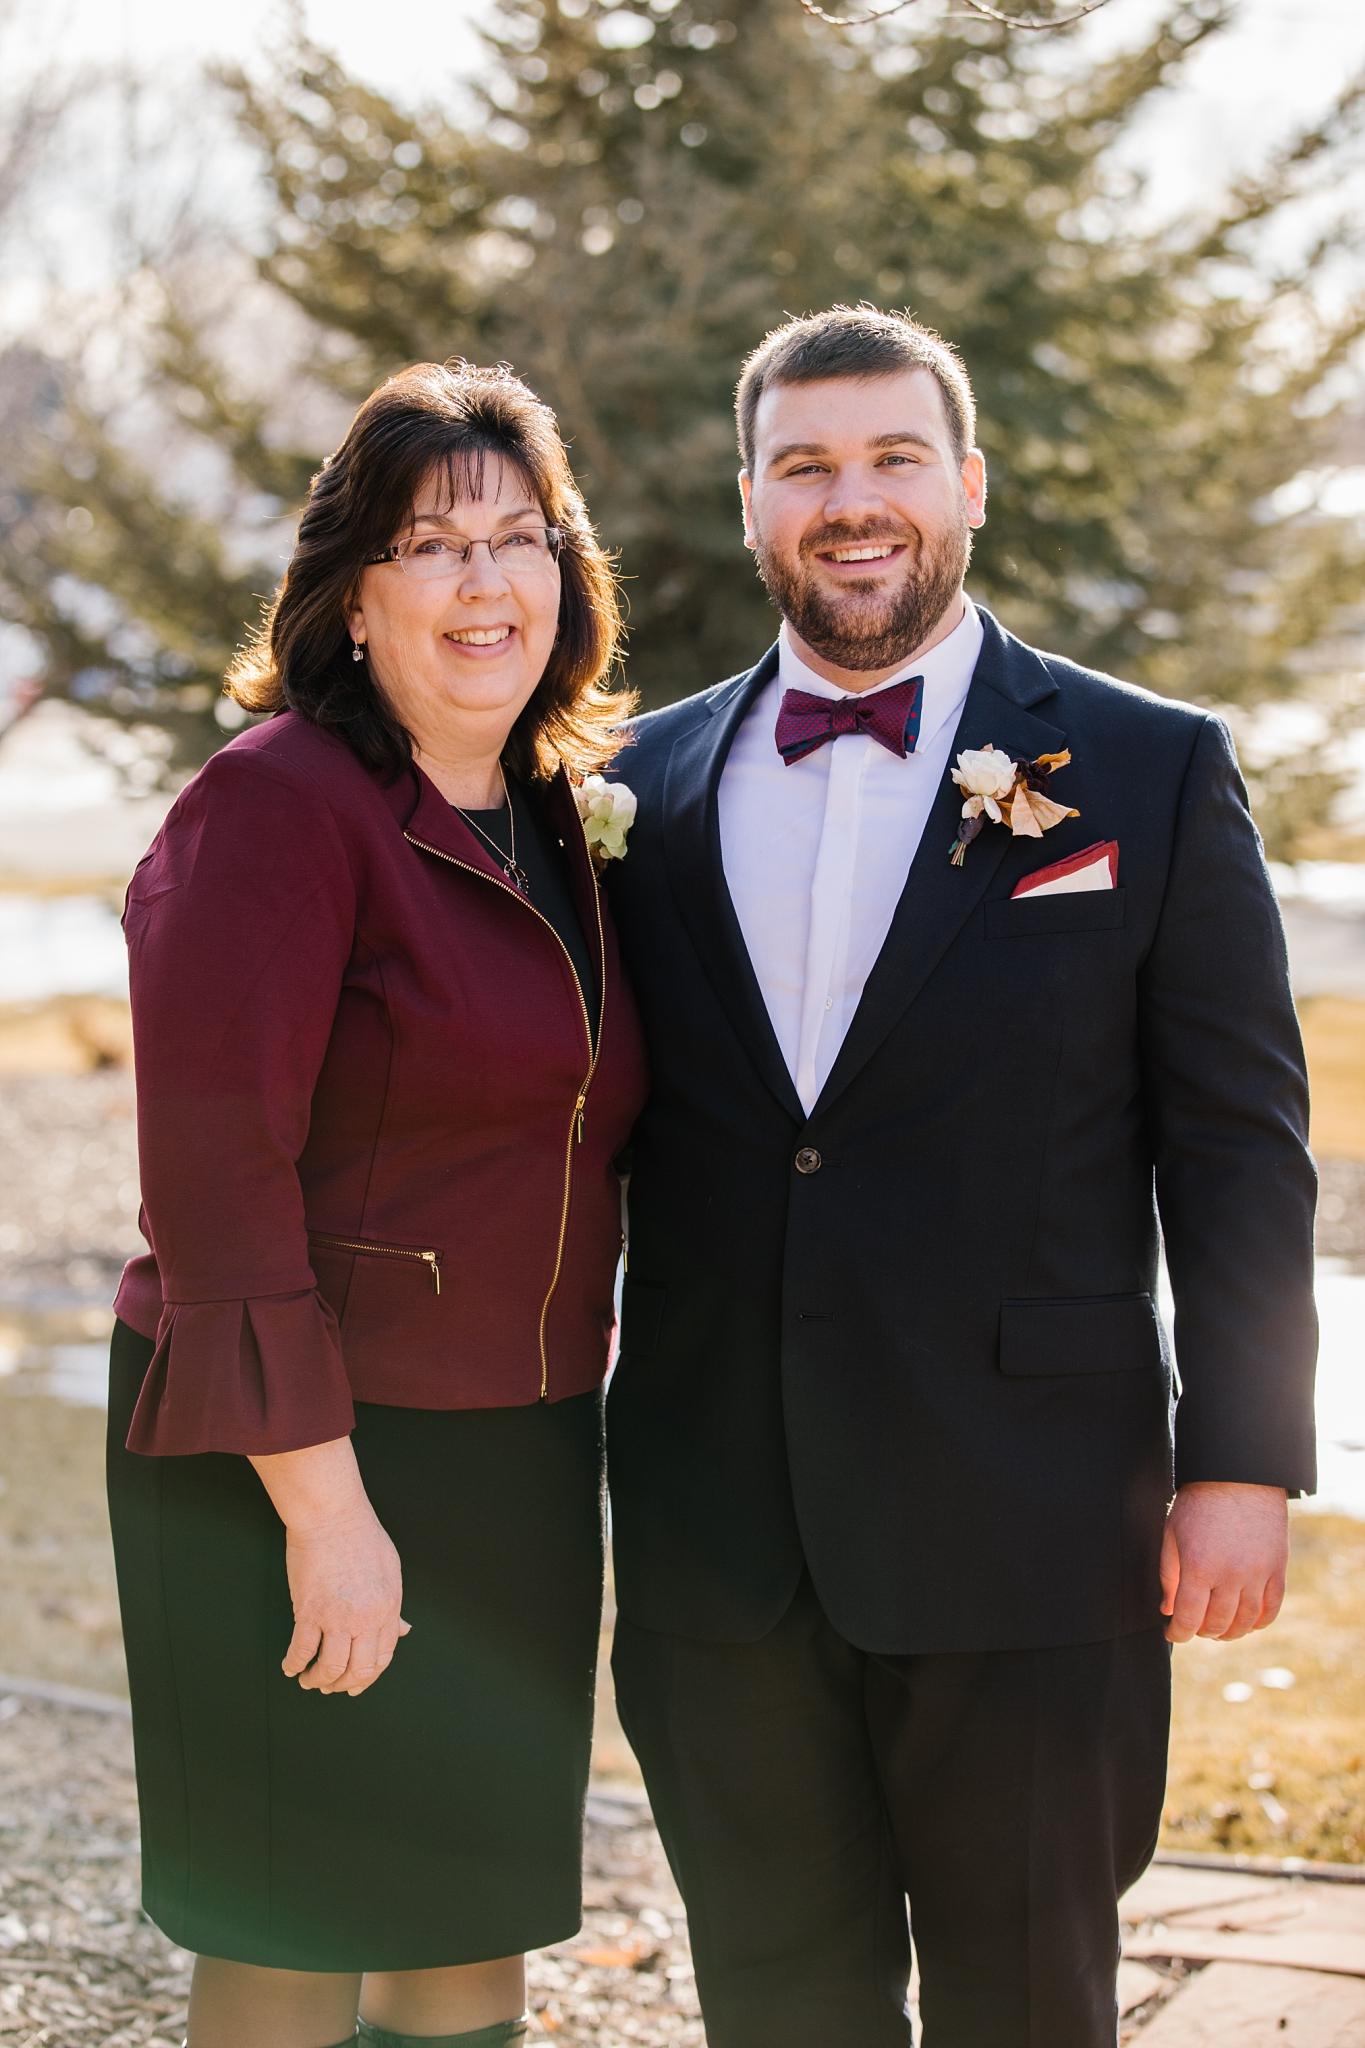 CN-Wedding-94_Lizzie-B-Imagery-Utah-Wedding-Photographer-Blessed-Sacrament-Catholic-Church-Sandy-Utah-The-Blended-Table-Salt-Lake-City.jpg